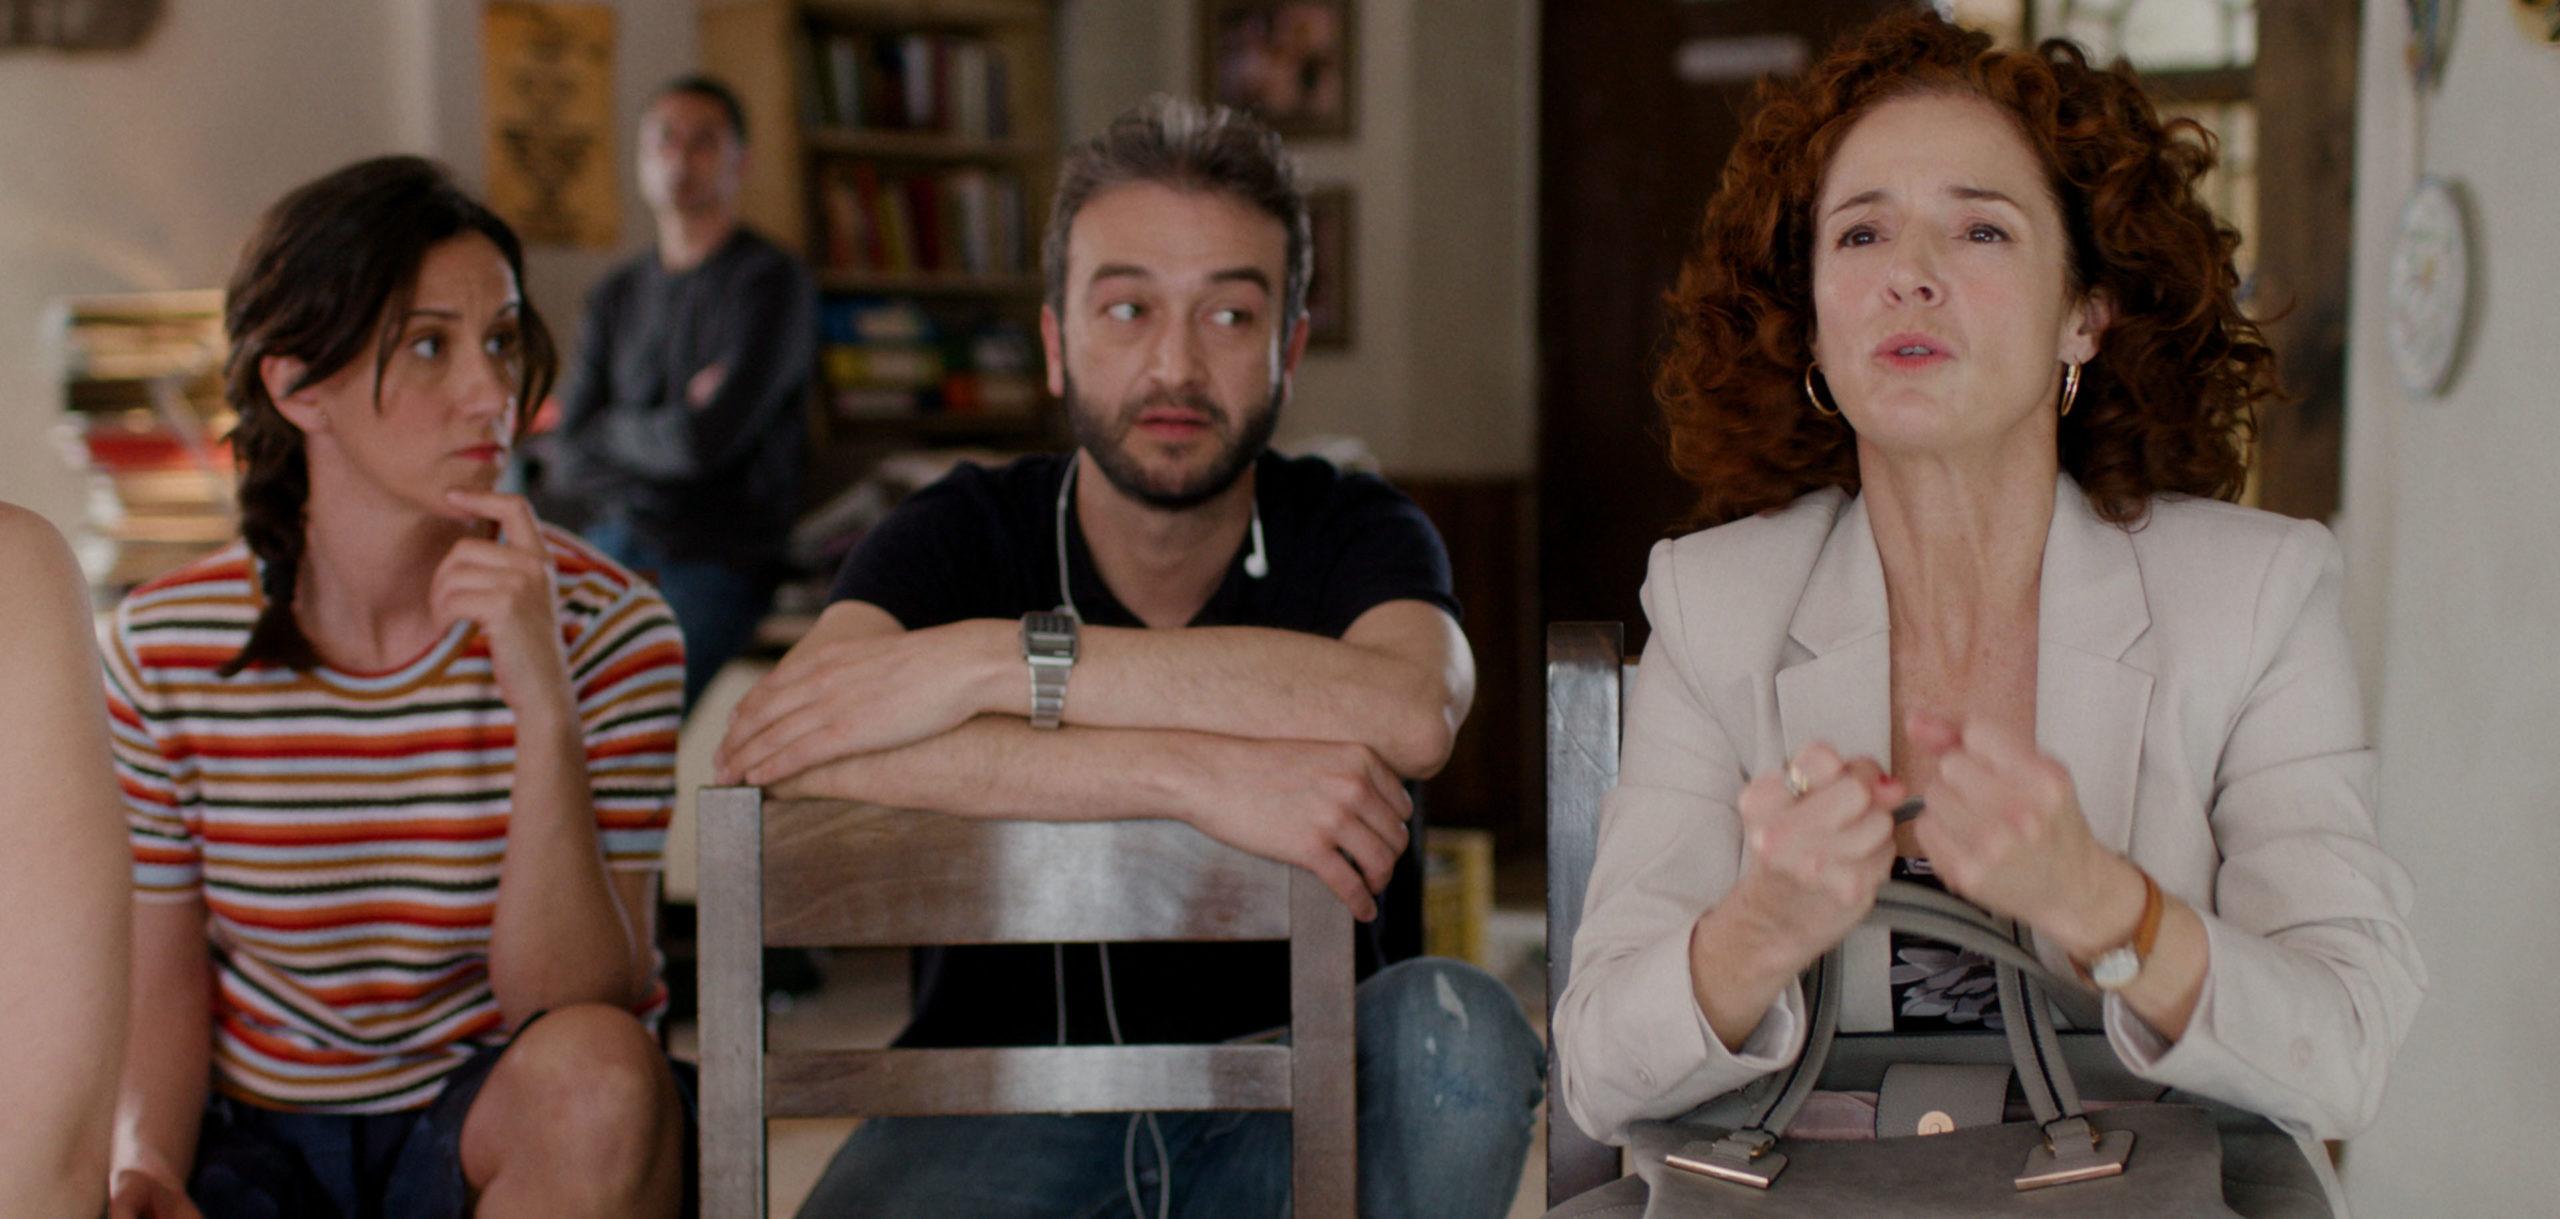 Asamblea, de Álex Montoya, se estrena en Filmin